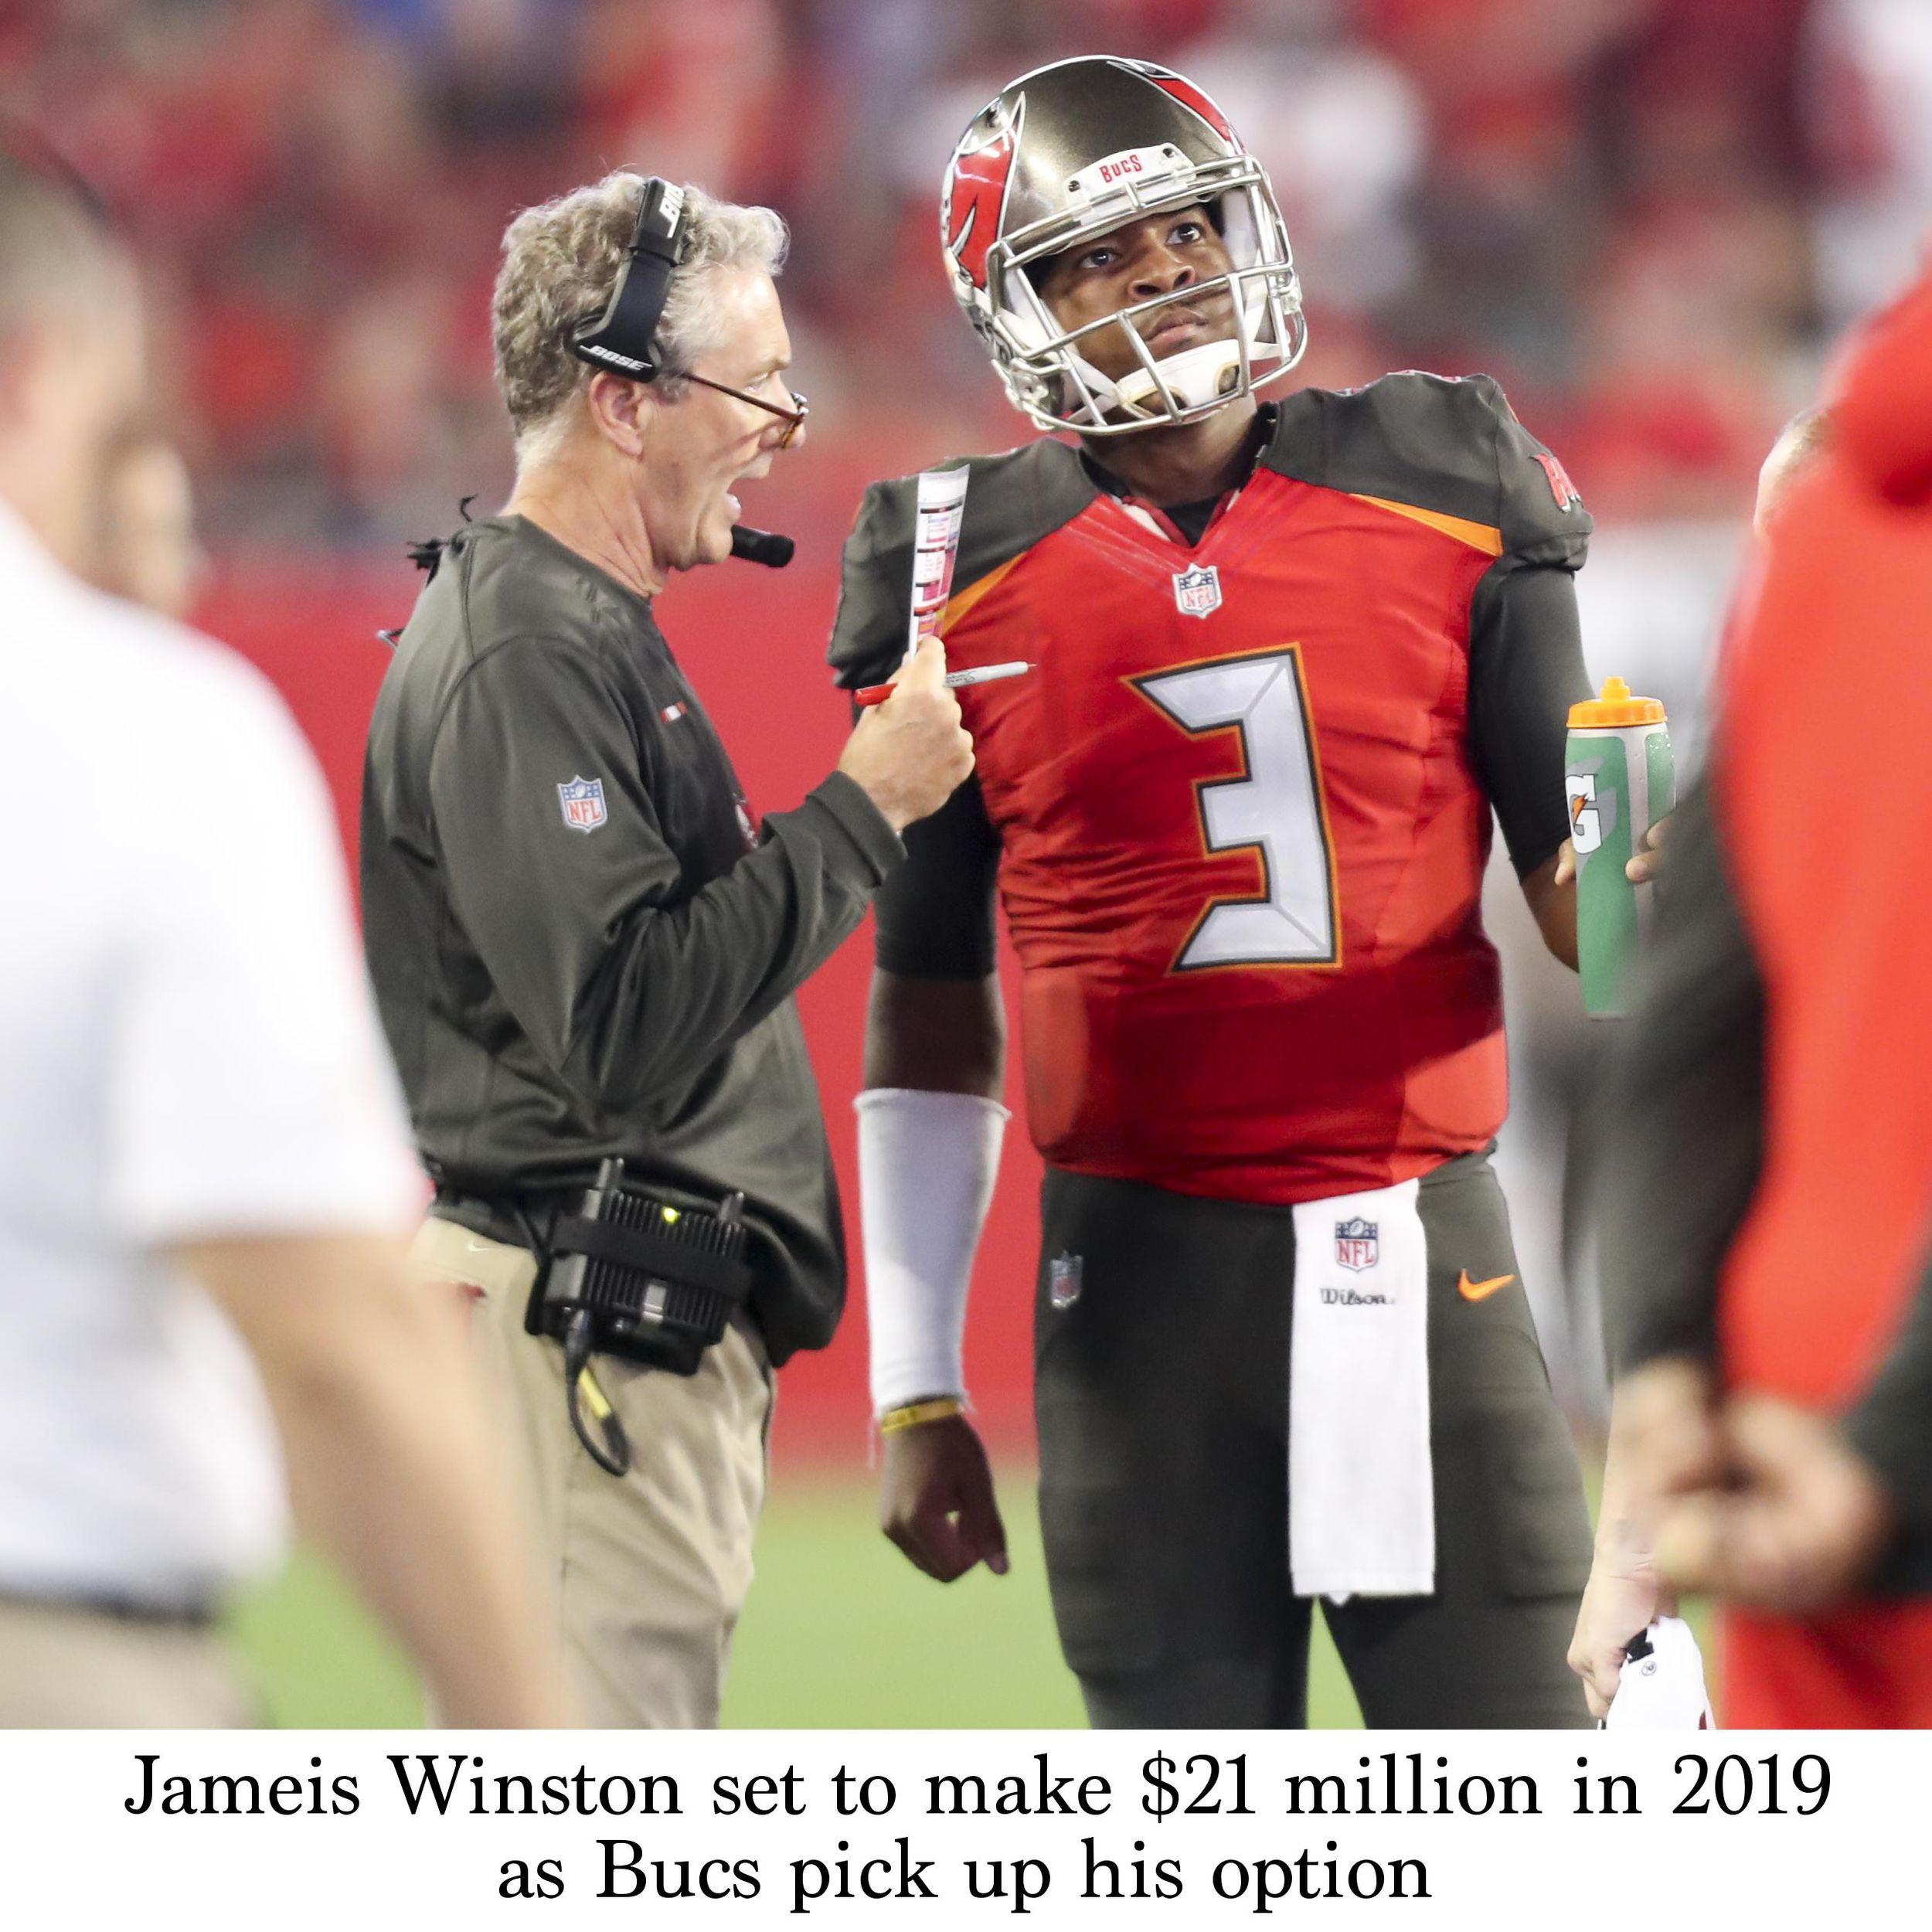 Jameis Winston set to make $21 million in 2019 as Bucs pick